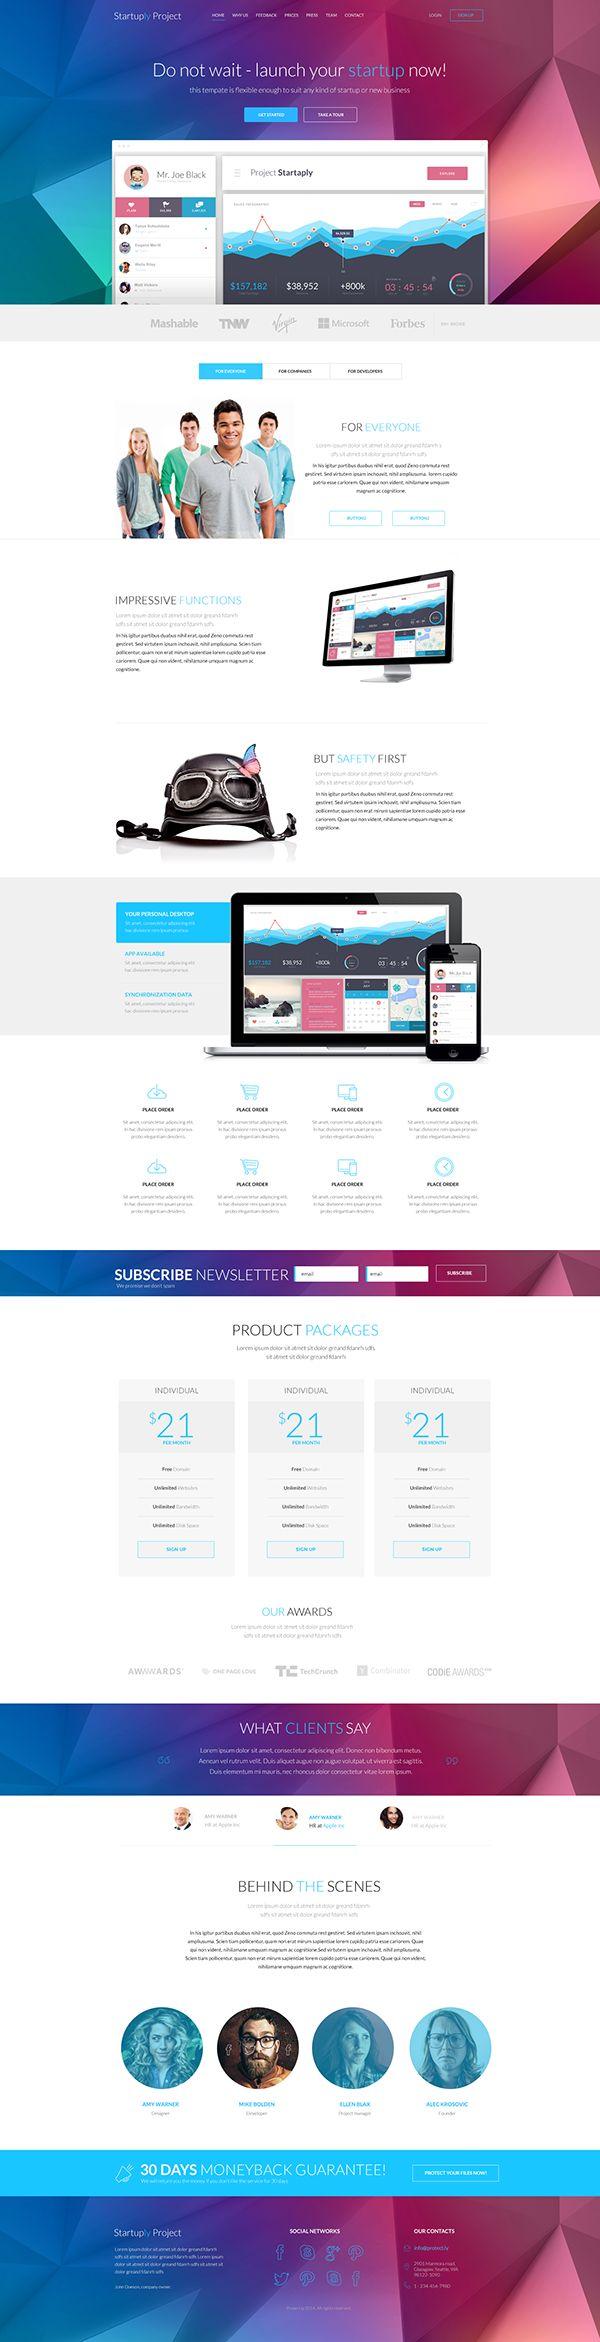 298 best Web Design & Layout images on Pinterest